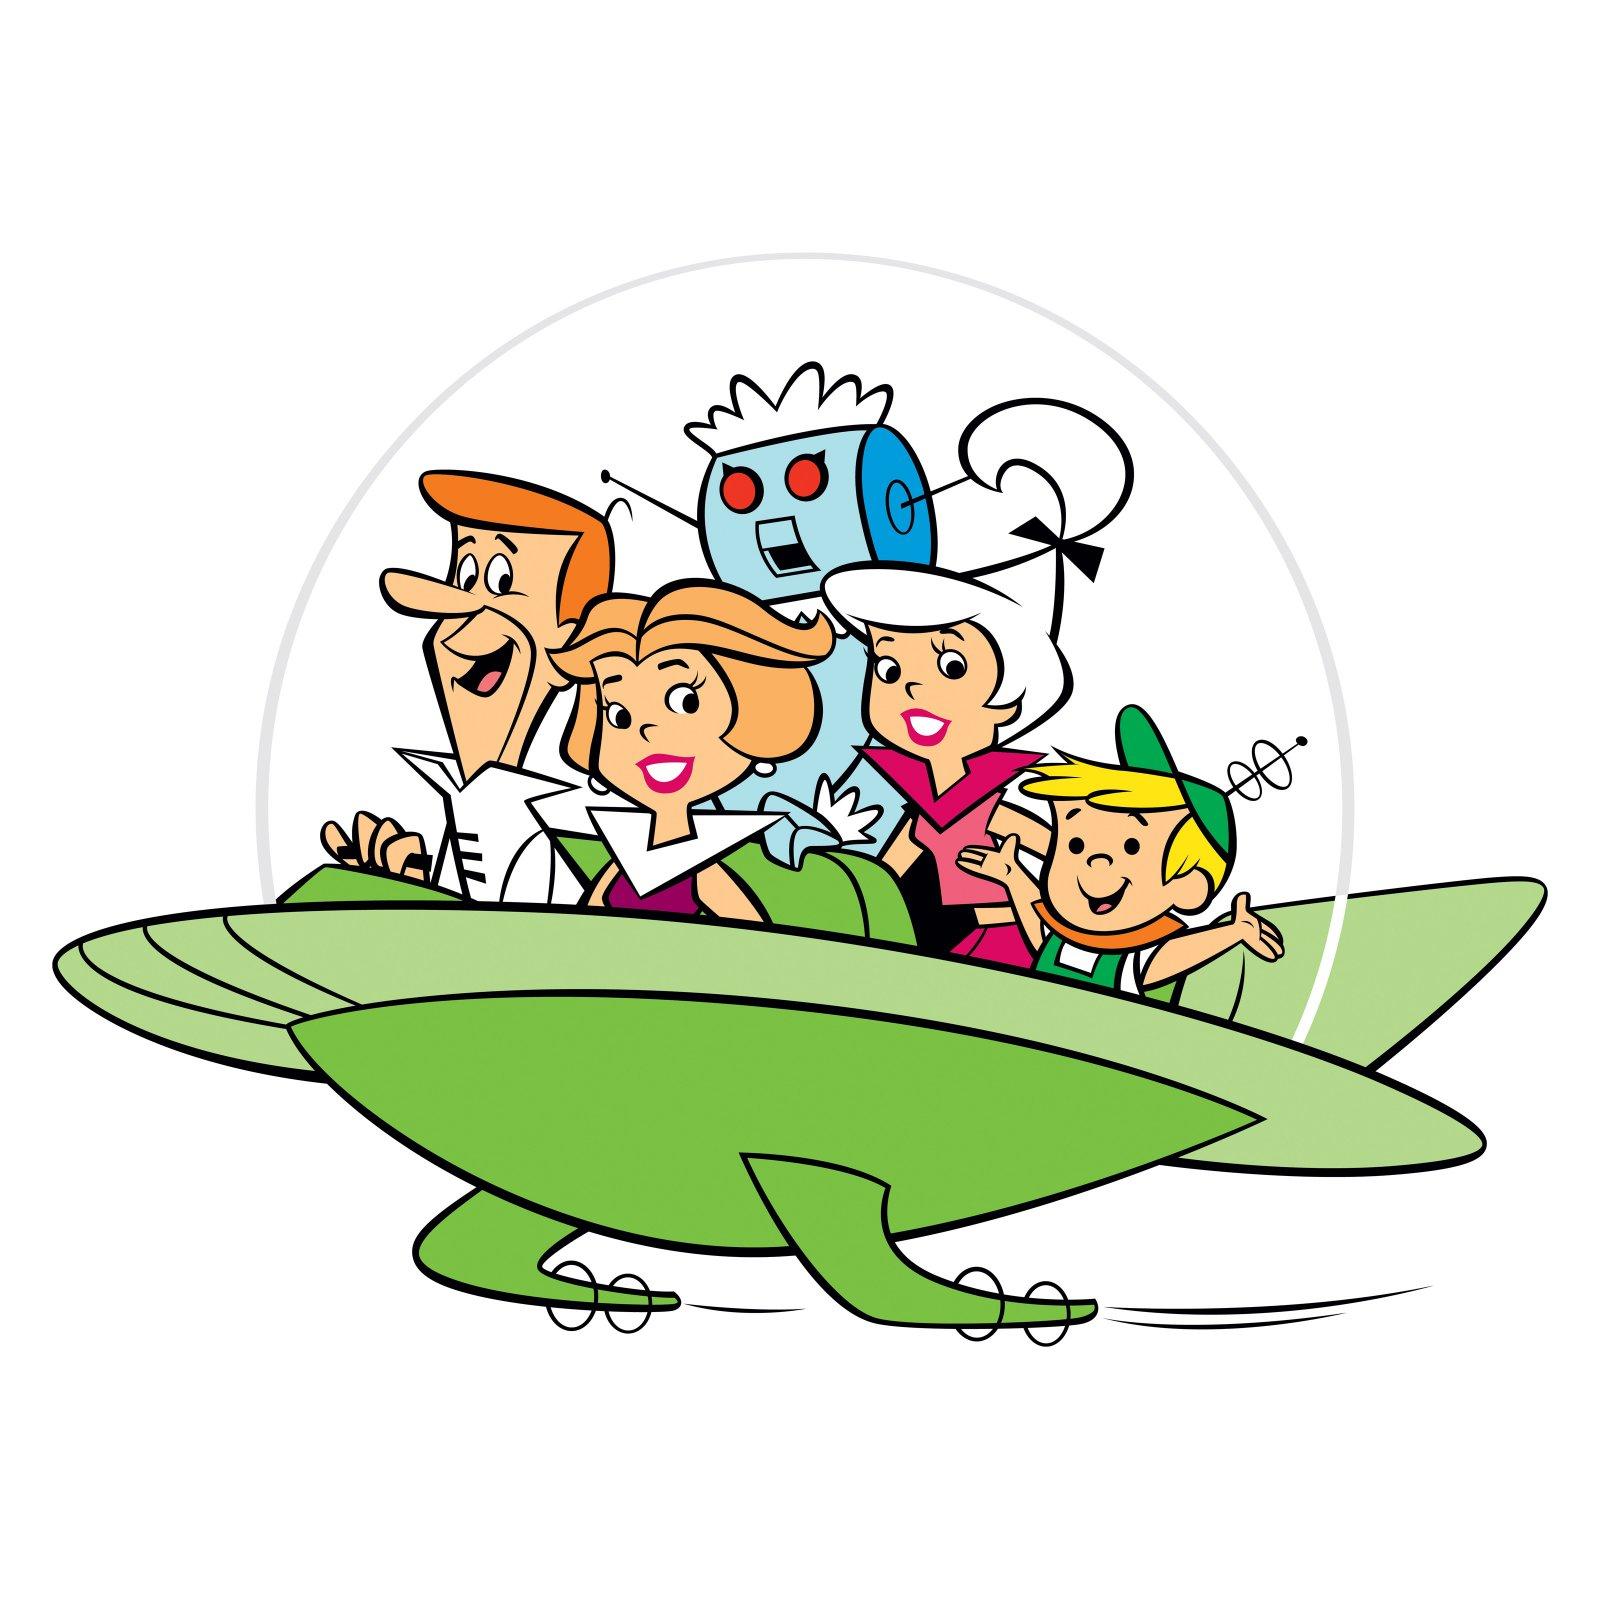 Illustratie: Hanna-Barbera Productions